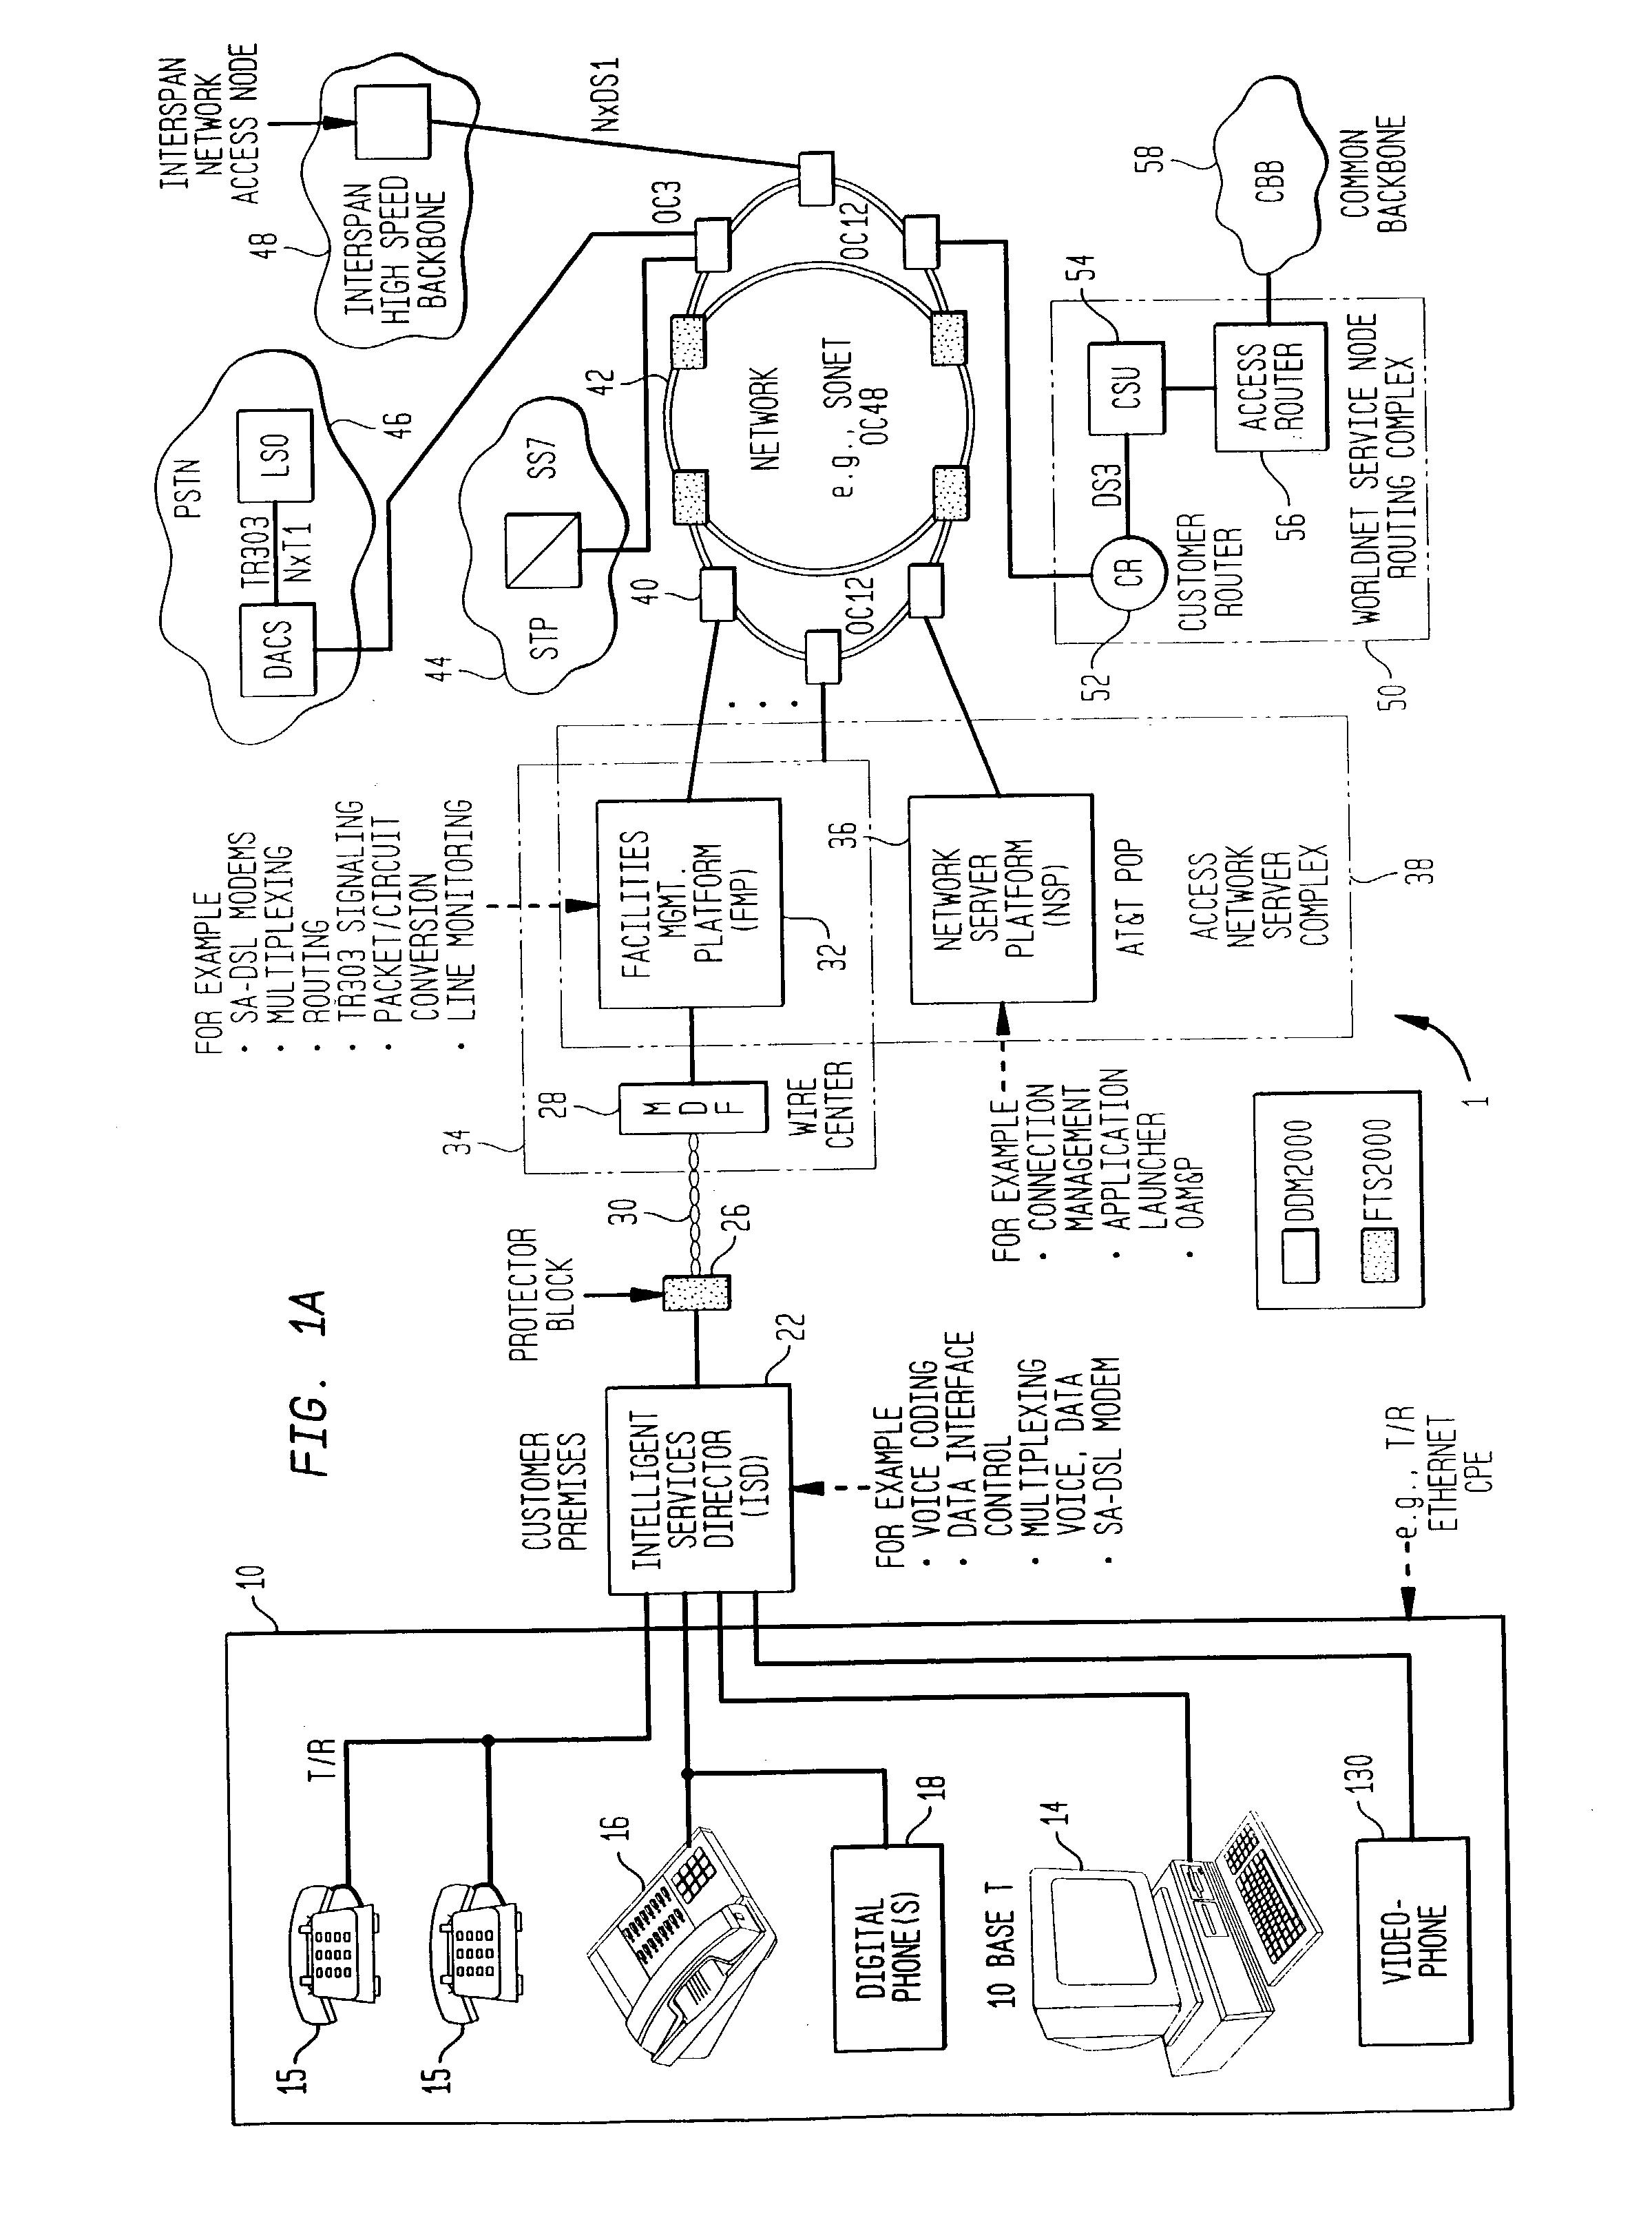 tivo moca wiring diagram wiring diagram database Network Cloud Icon moca tivo mini network diagram wiring diagram database antena tivo moca diagram modem coax cable box